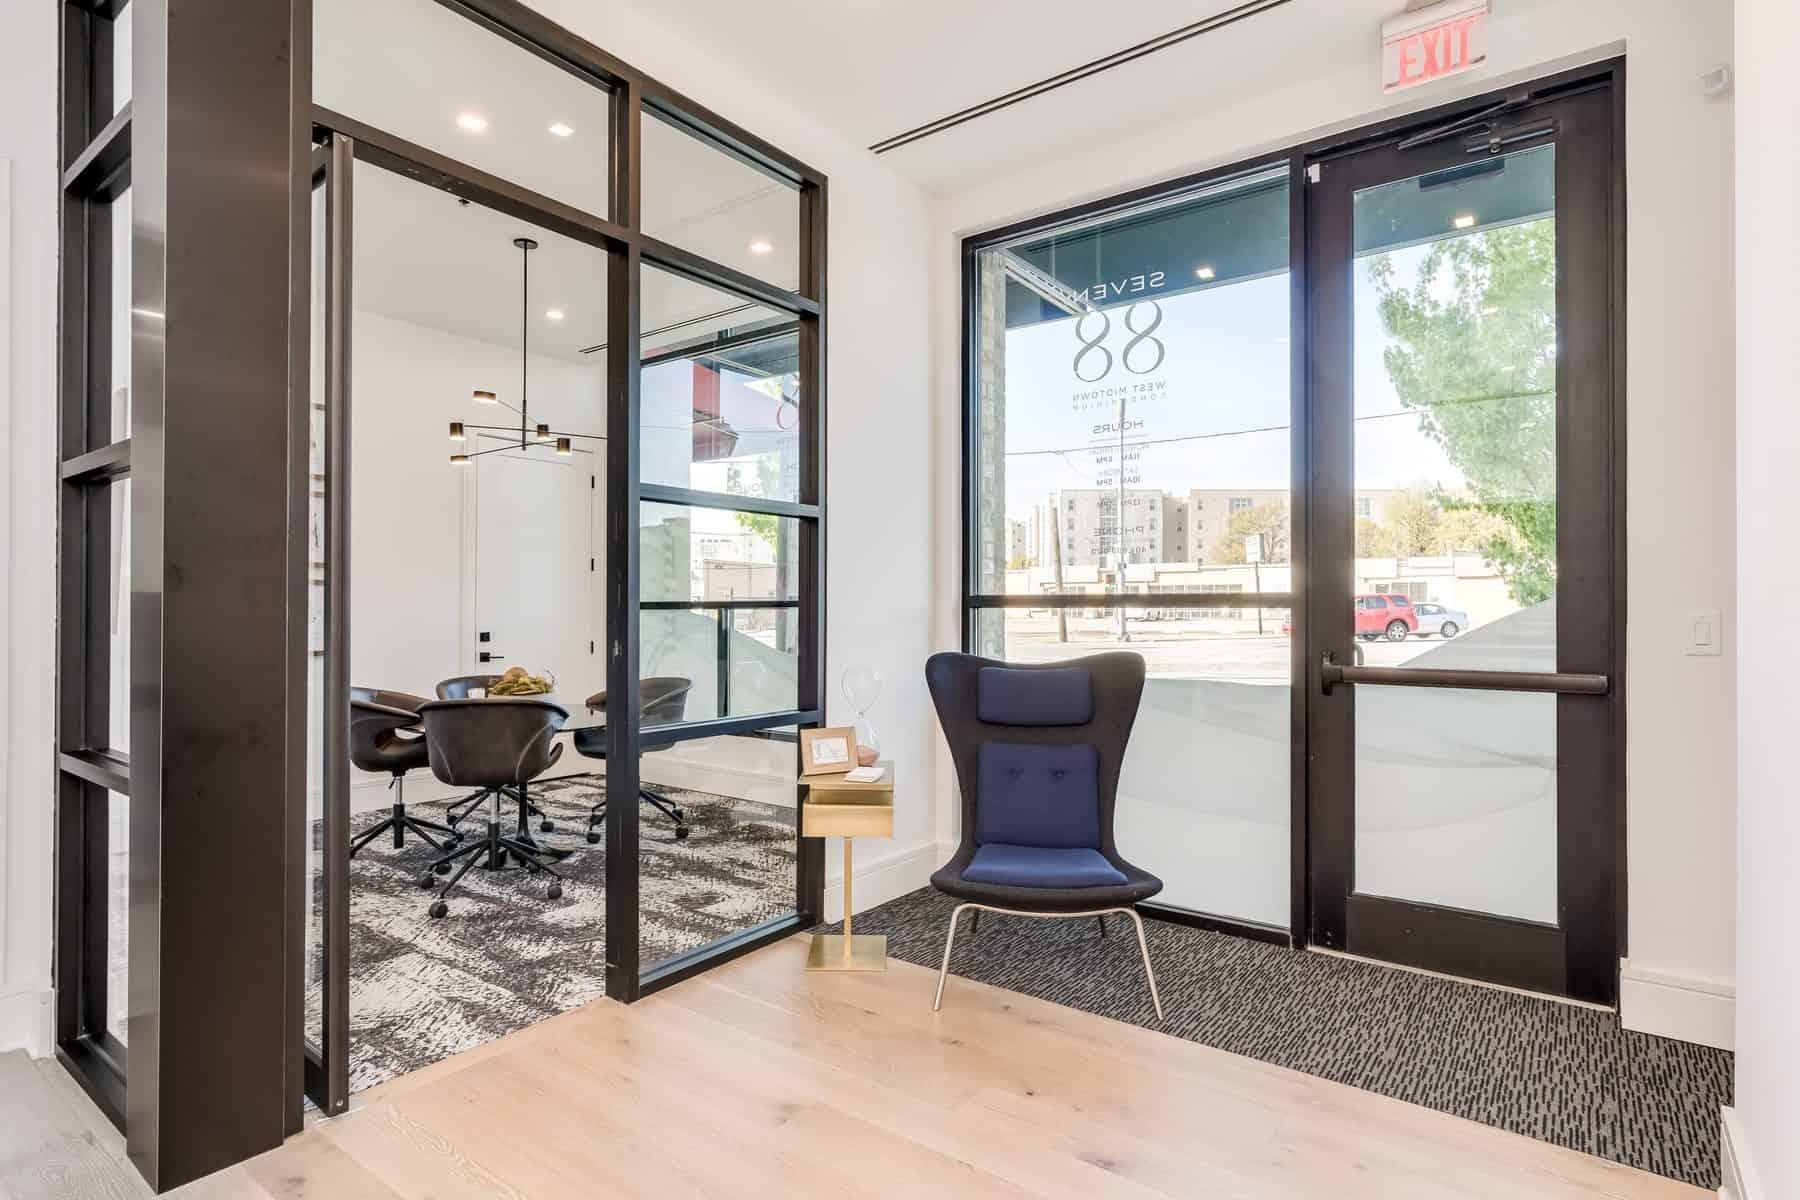 Crosby Design Group Wins OBIE for Seven88 West Midtown Sales Center